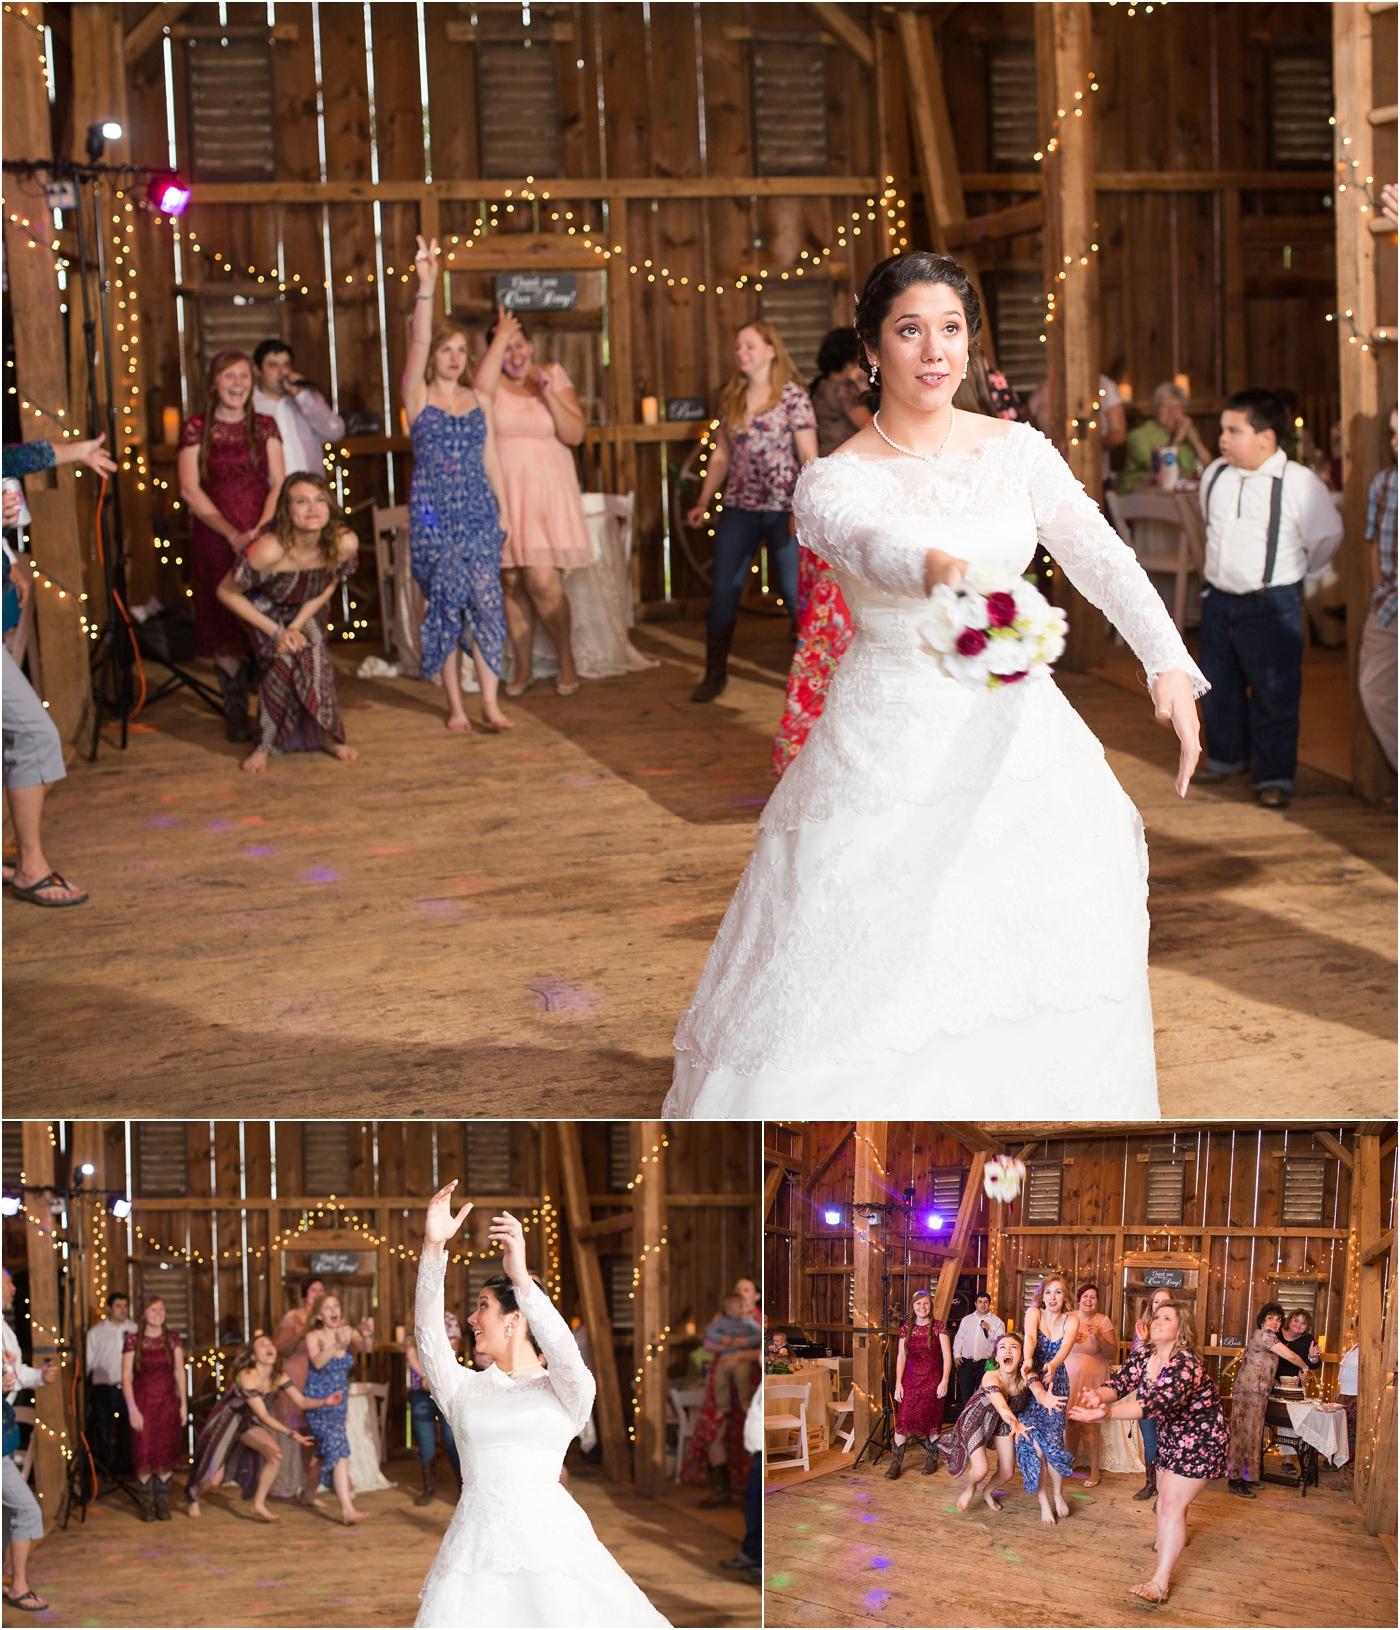 Maryland-Barn-Wedding-Photos-123.jpg